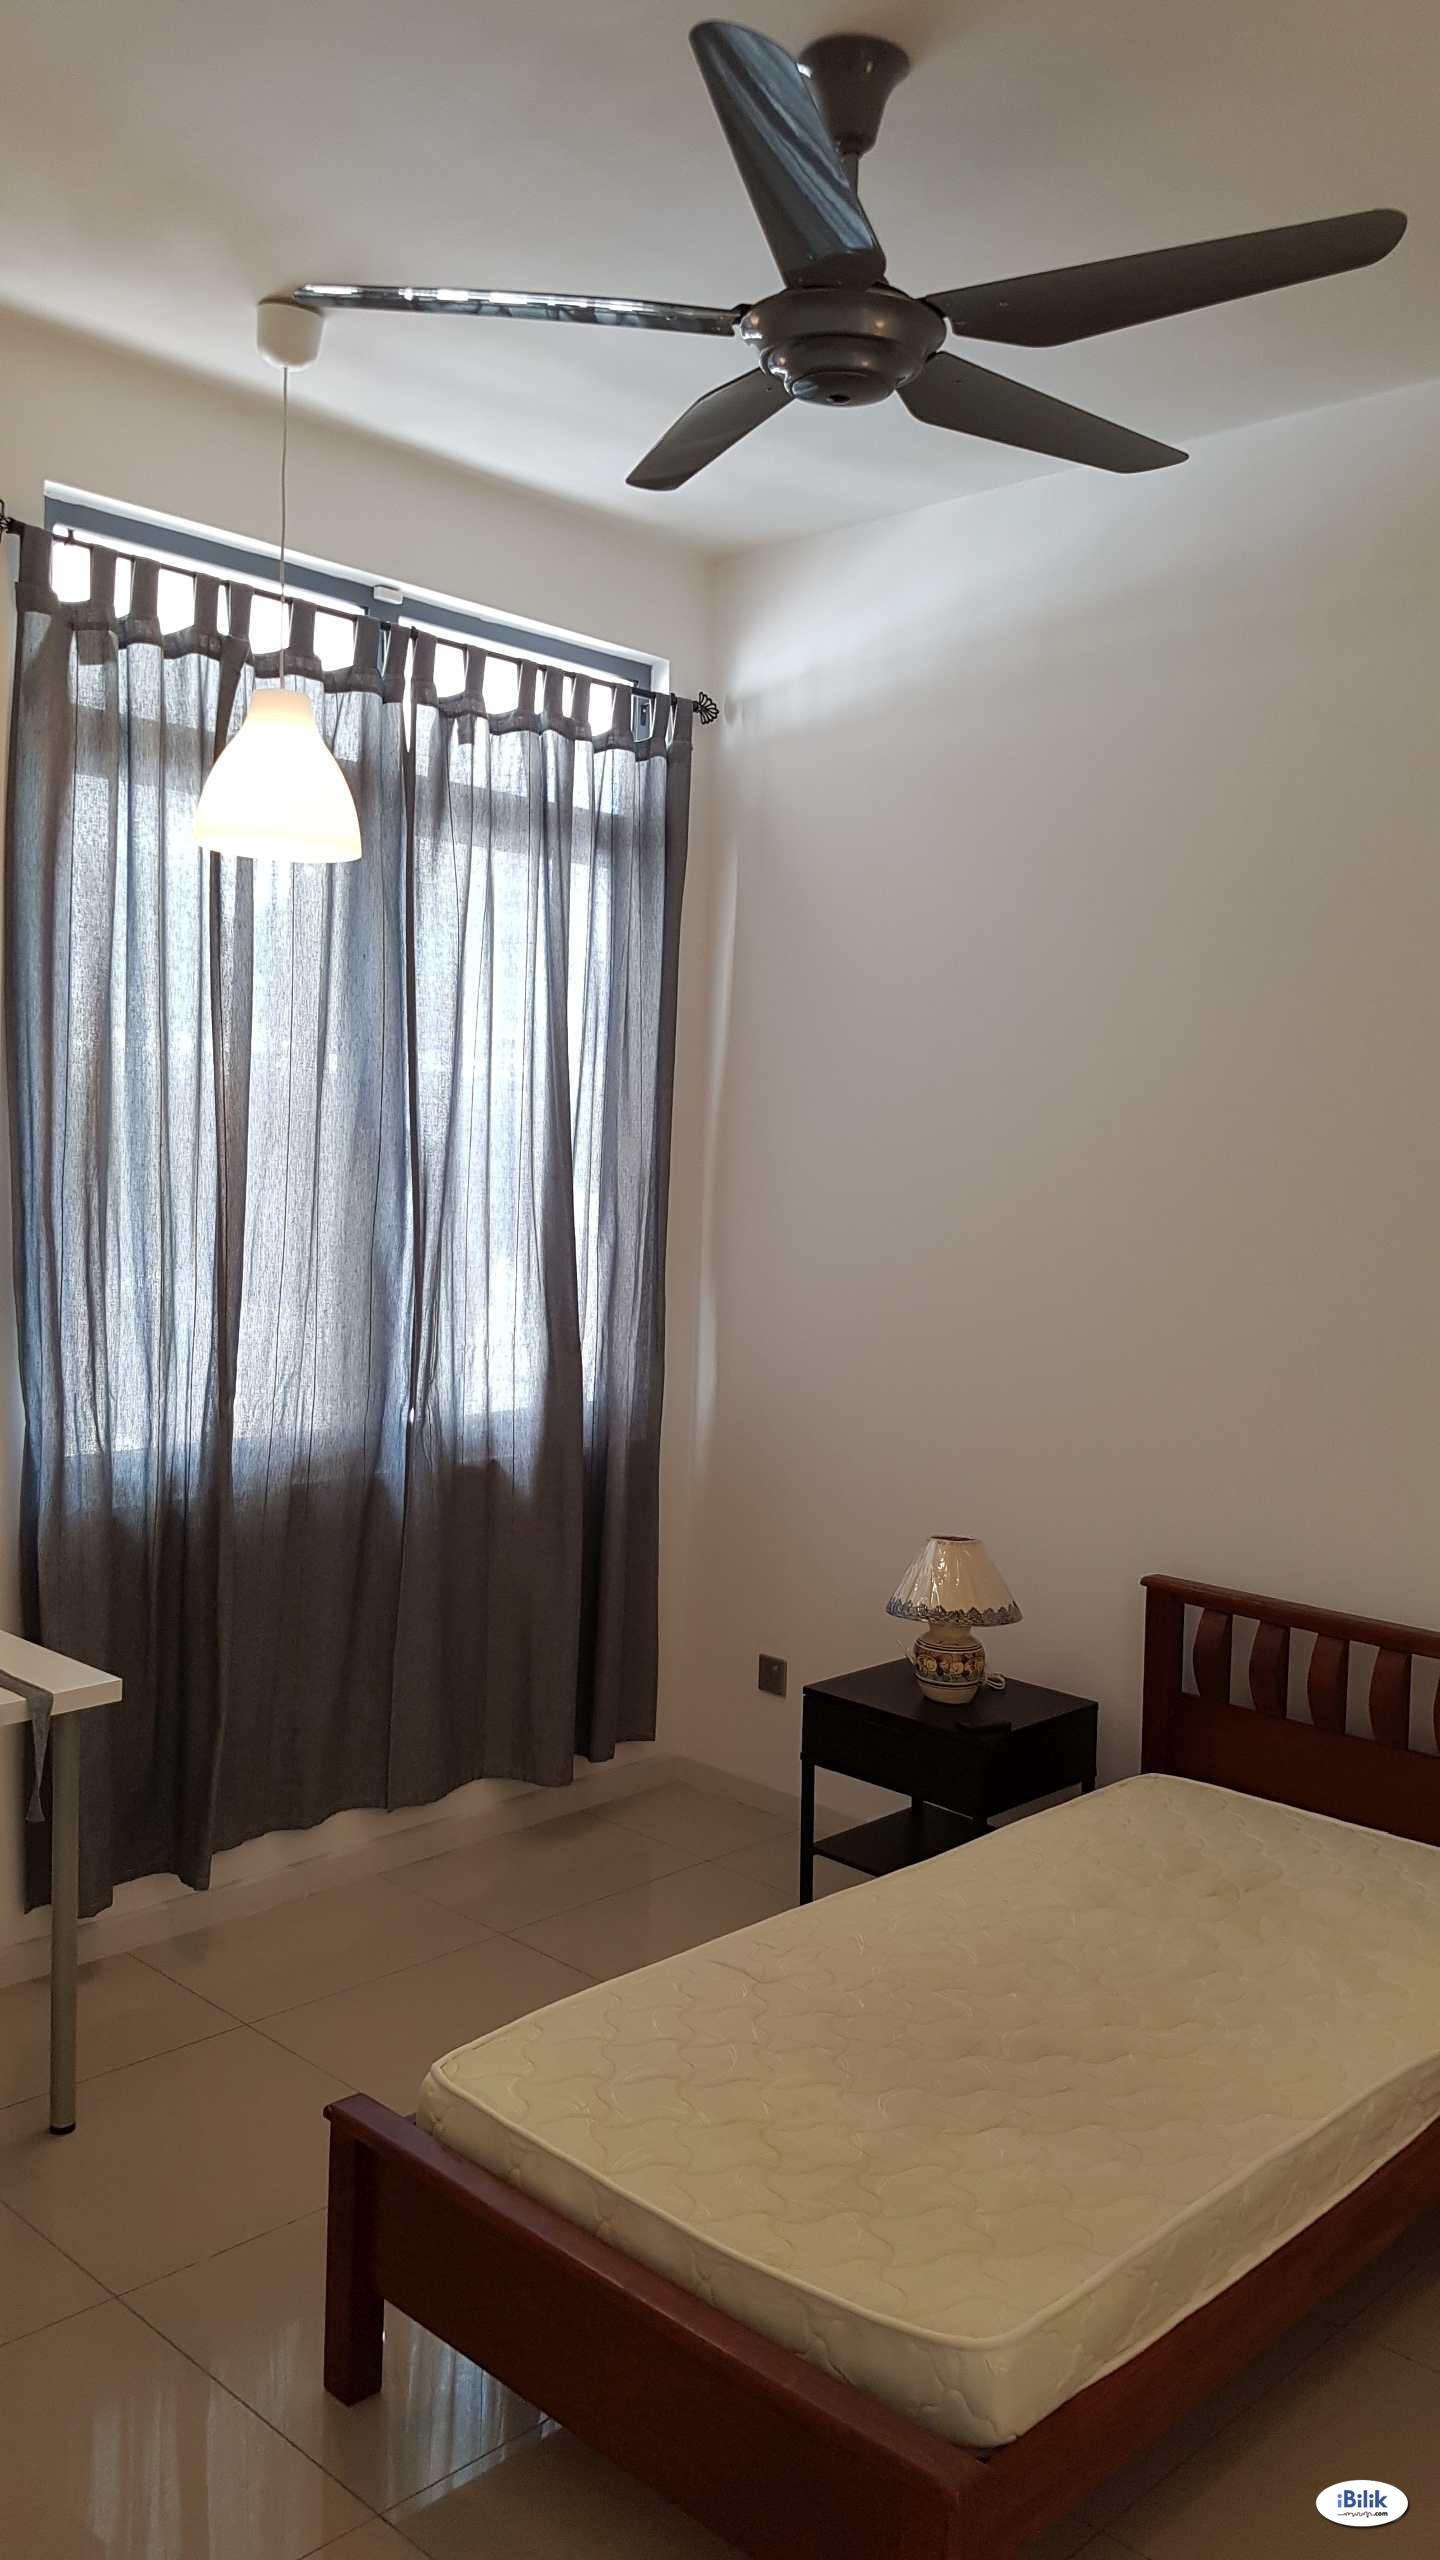 Single Room at Summerglades Cyberjaya, Selangor